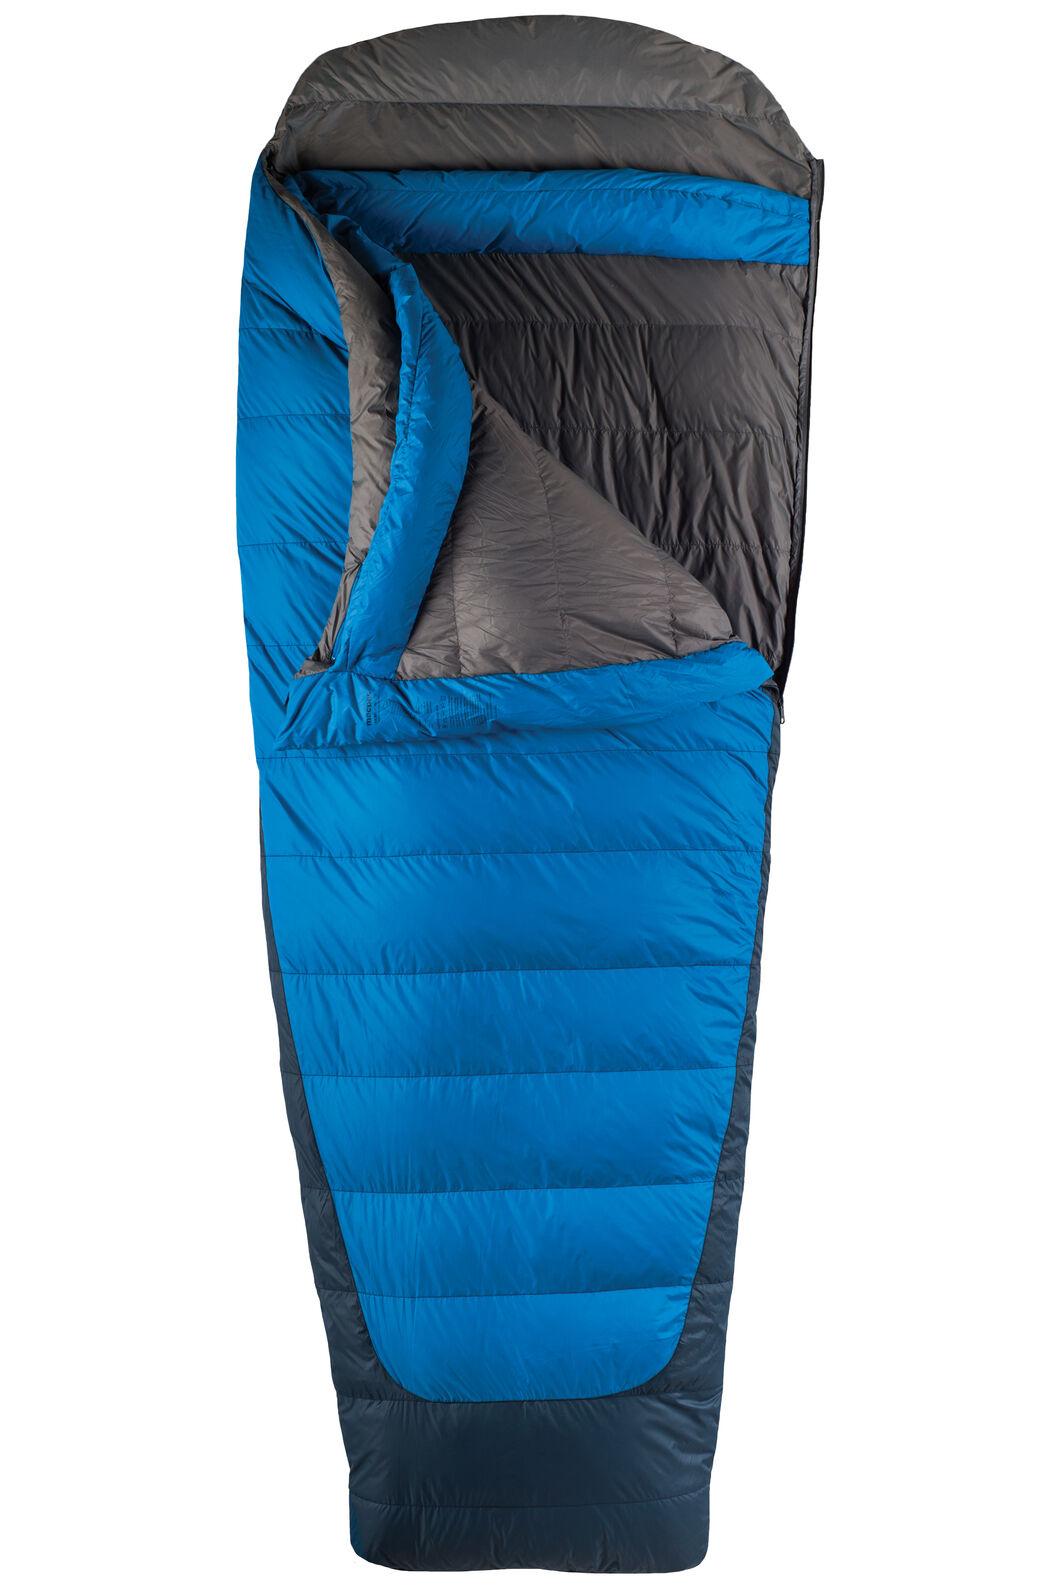 Macpac Escapade 700 Women's Down Sleeping Bag, Classic Blue, hi-res